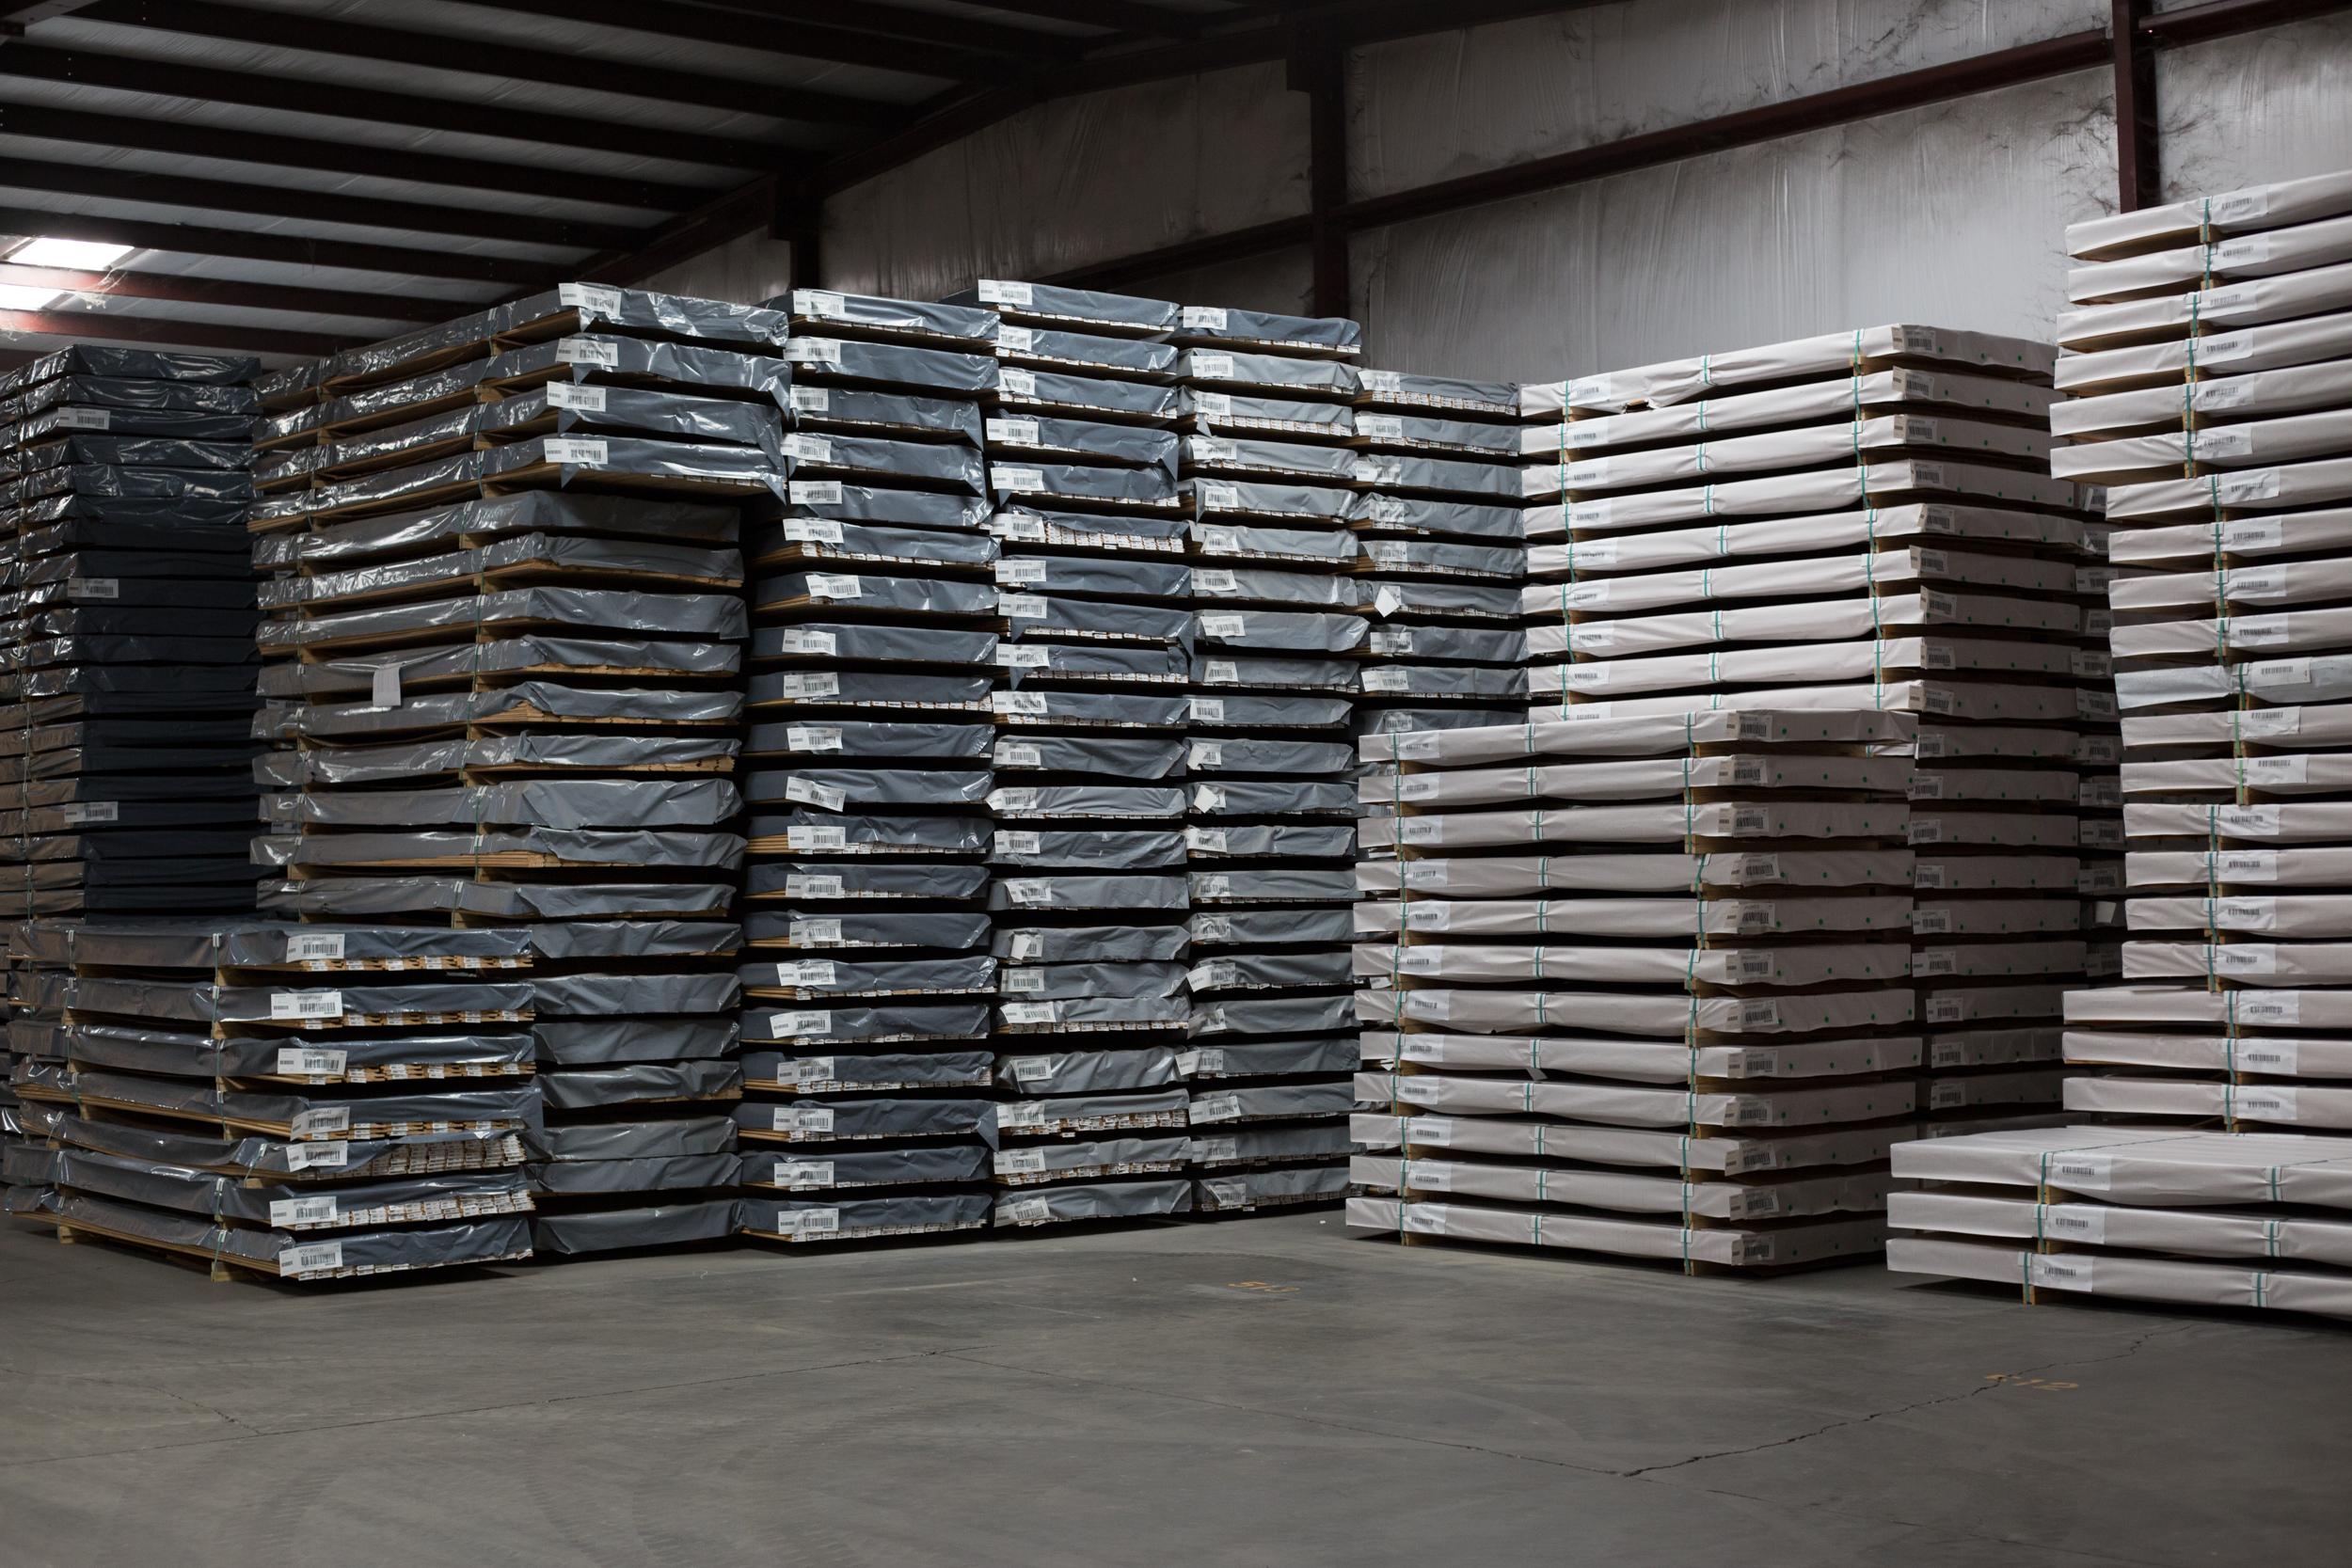 east coast lumber yard Kisley-16.jpg